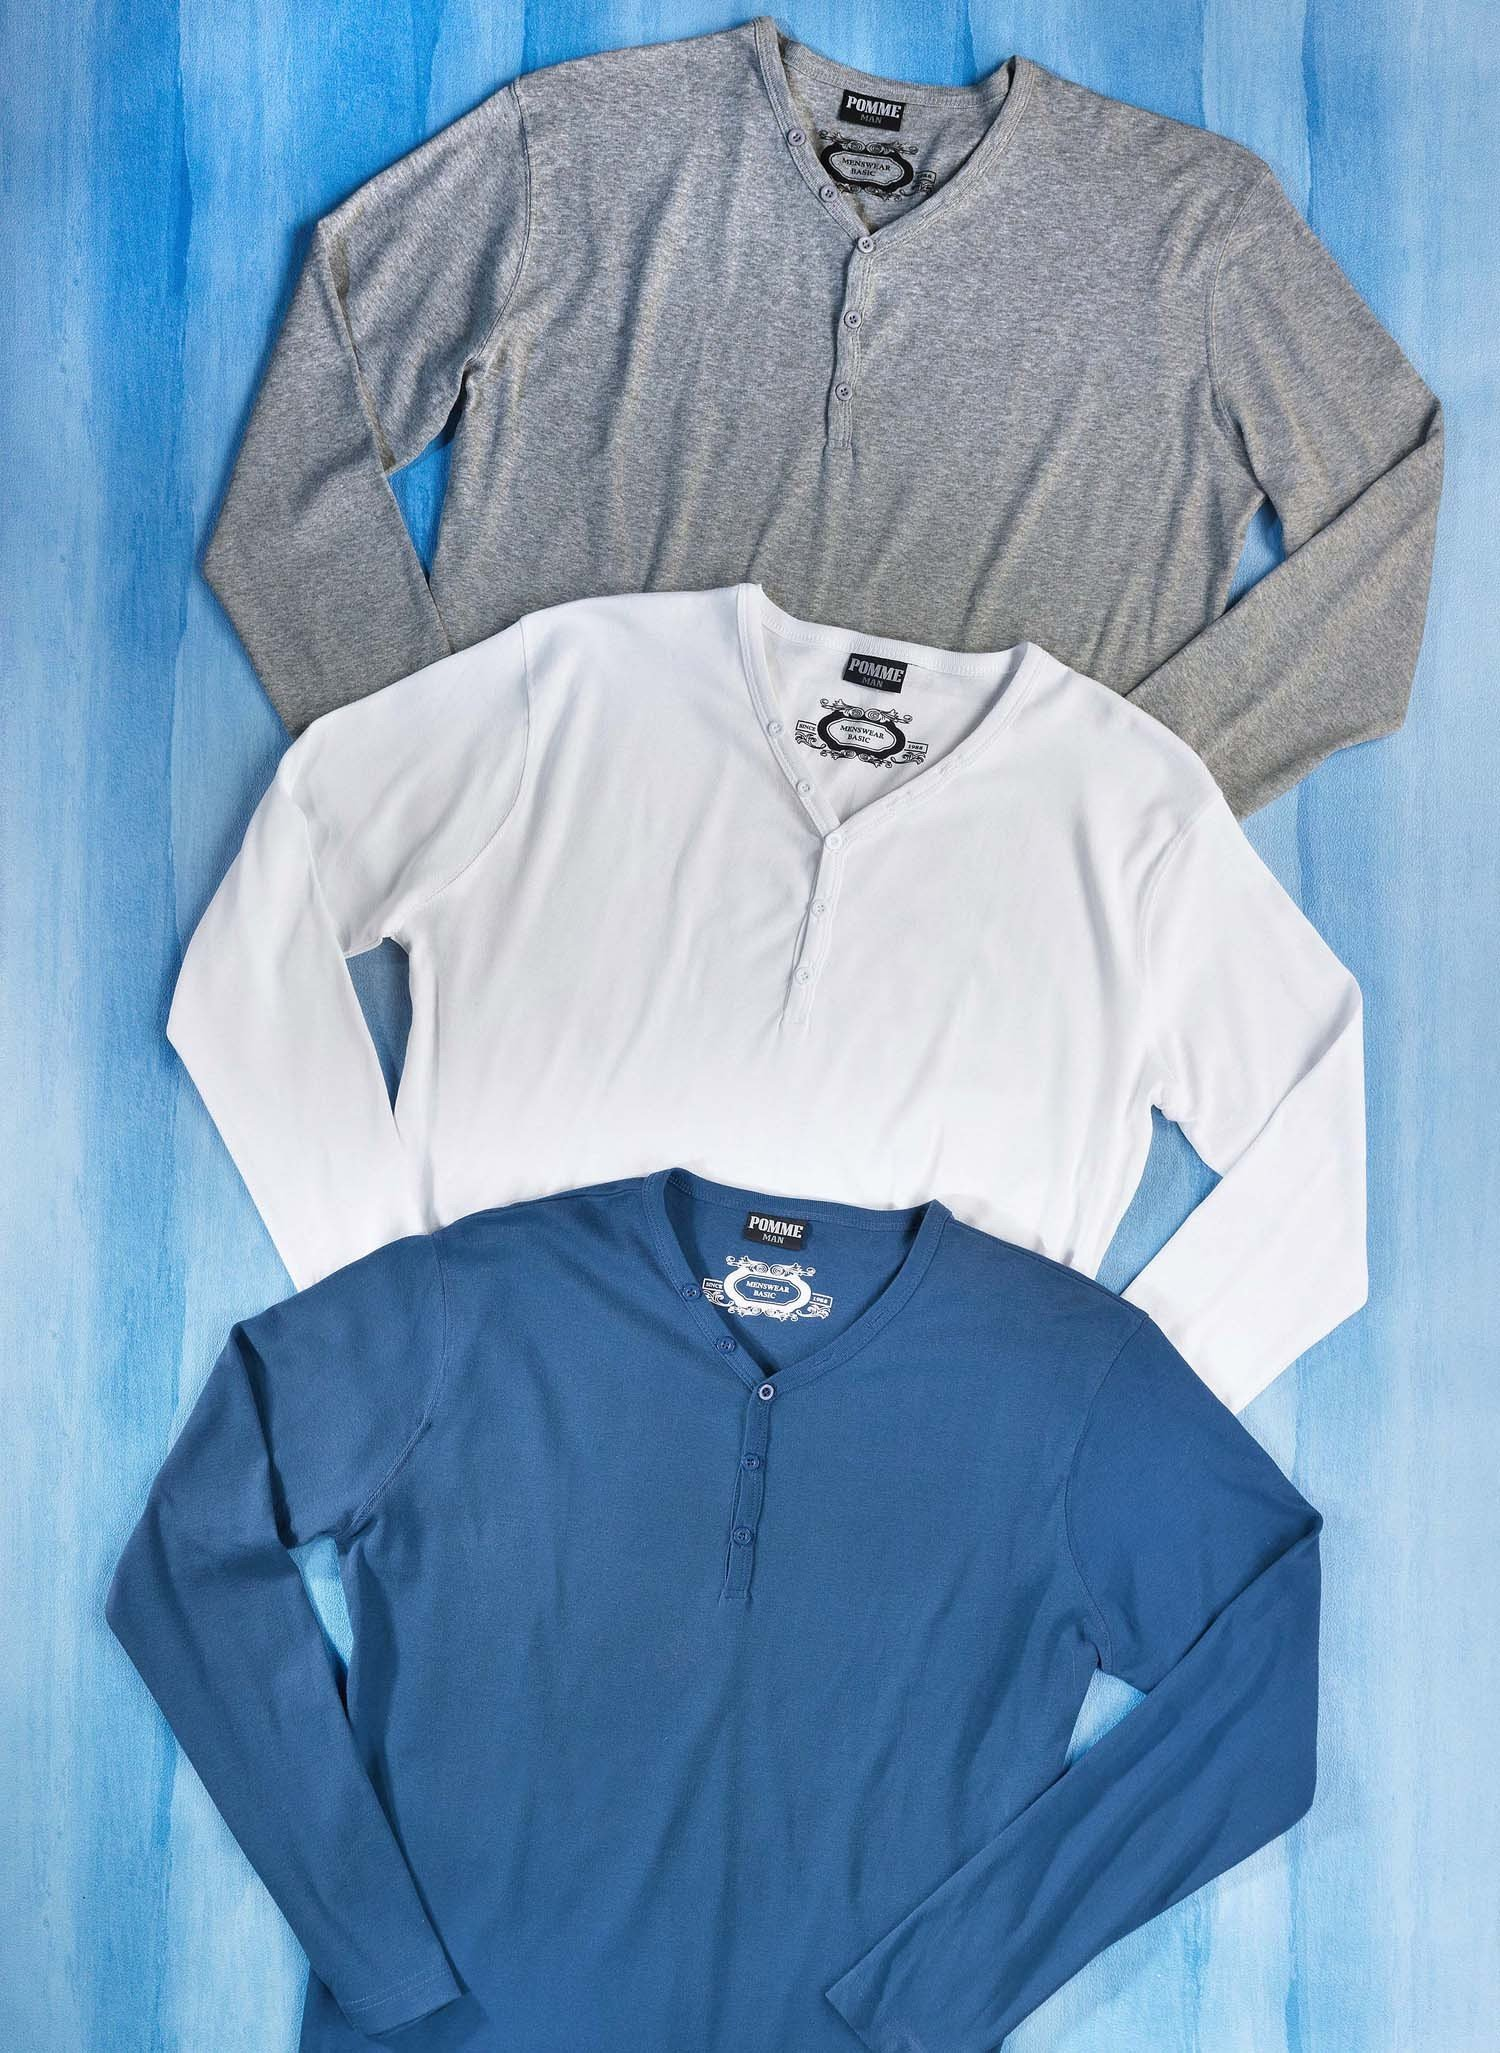 H-LA-Shirt,Knopfleiste grau m. L 004